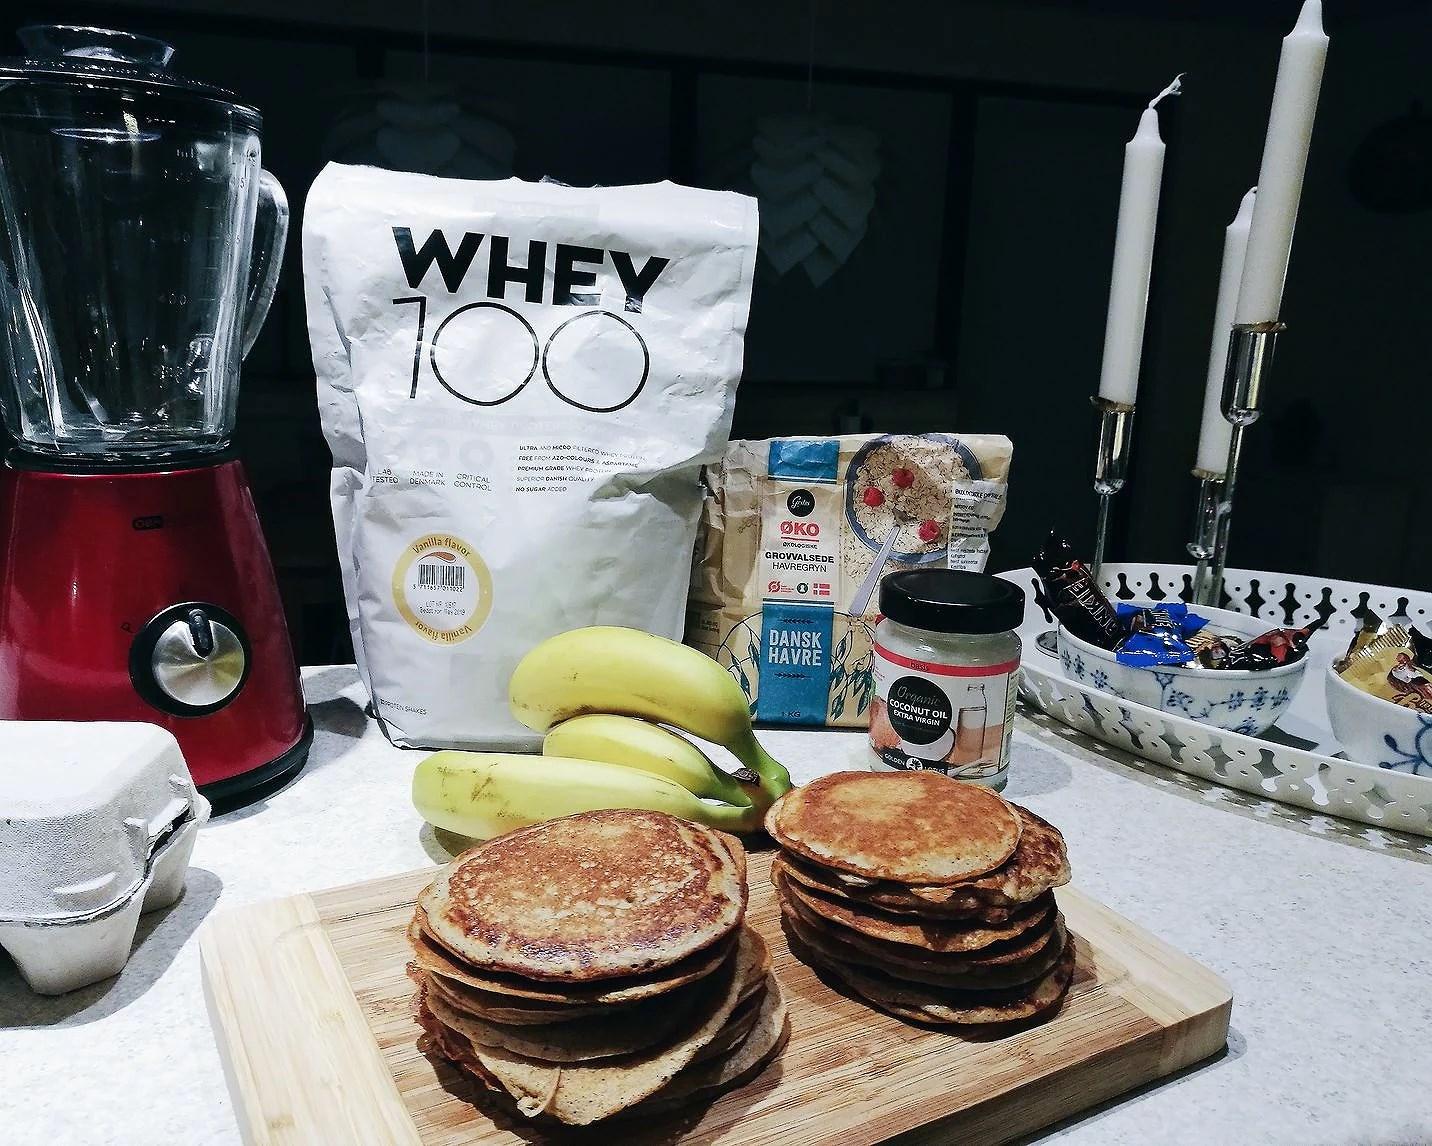 Pandekager med proteinpulver